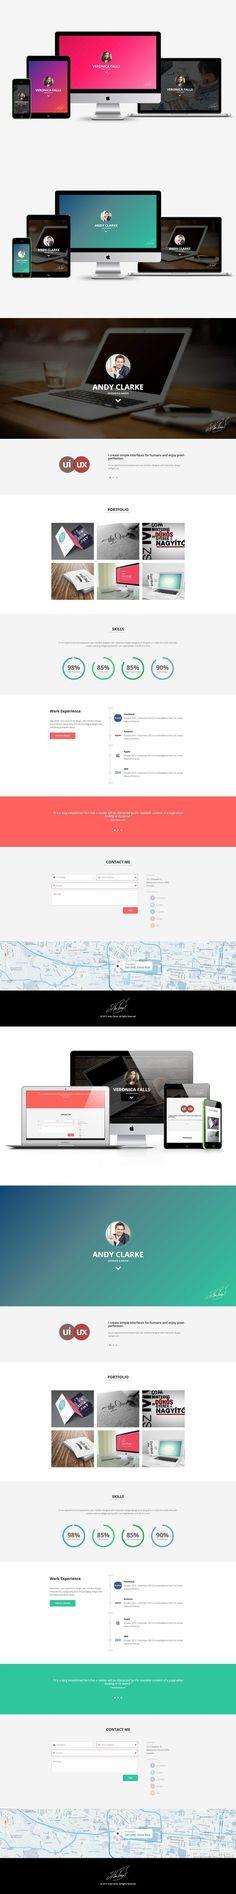 Ezna u2013 Personal Portfolio Template HTML\/CSS Themes HTML\/CSS - resume templates html